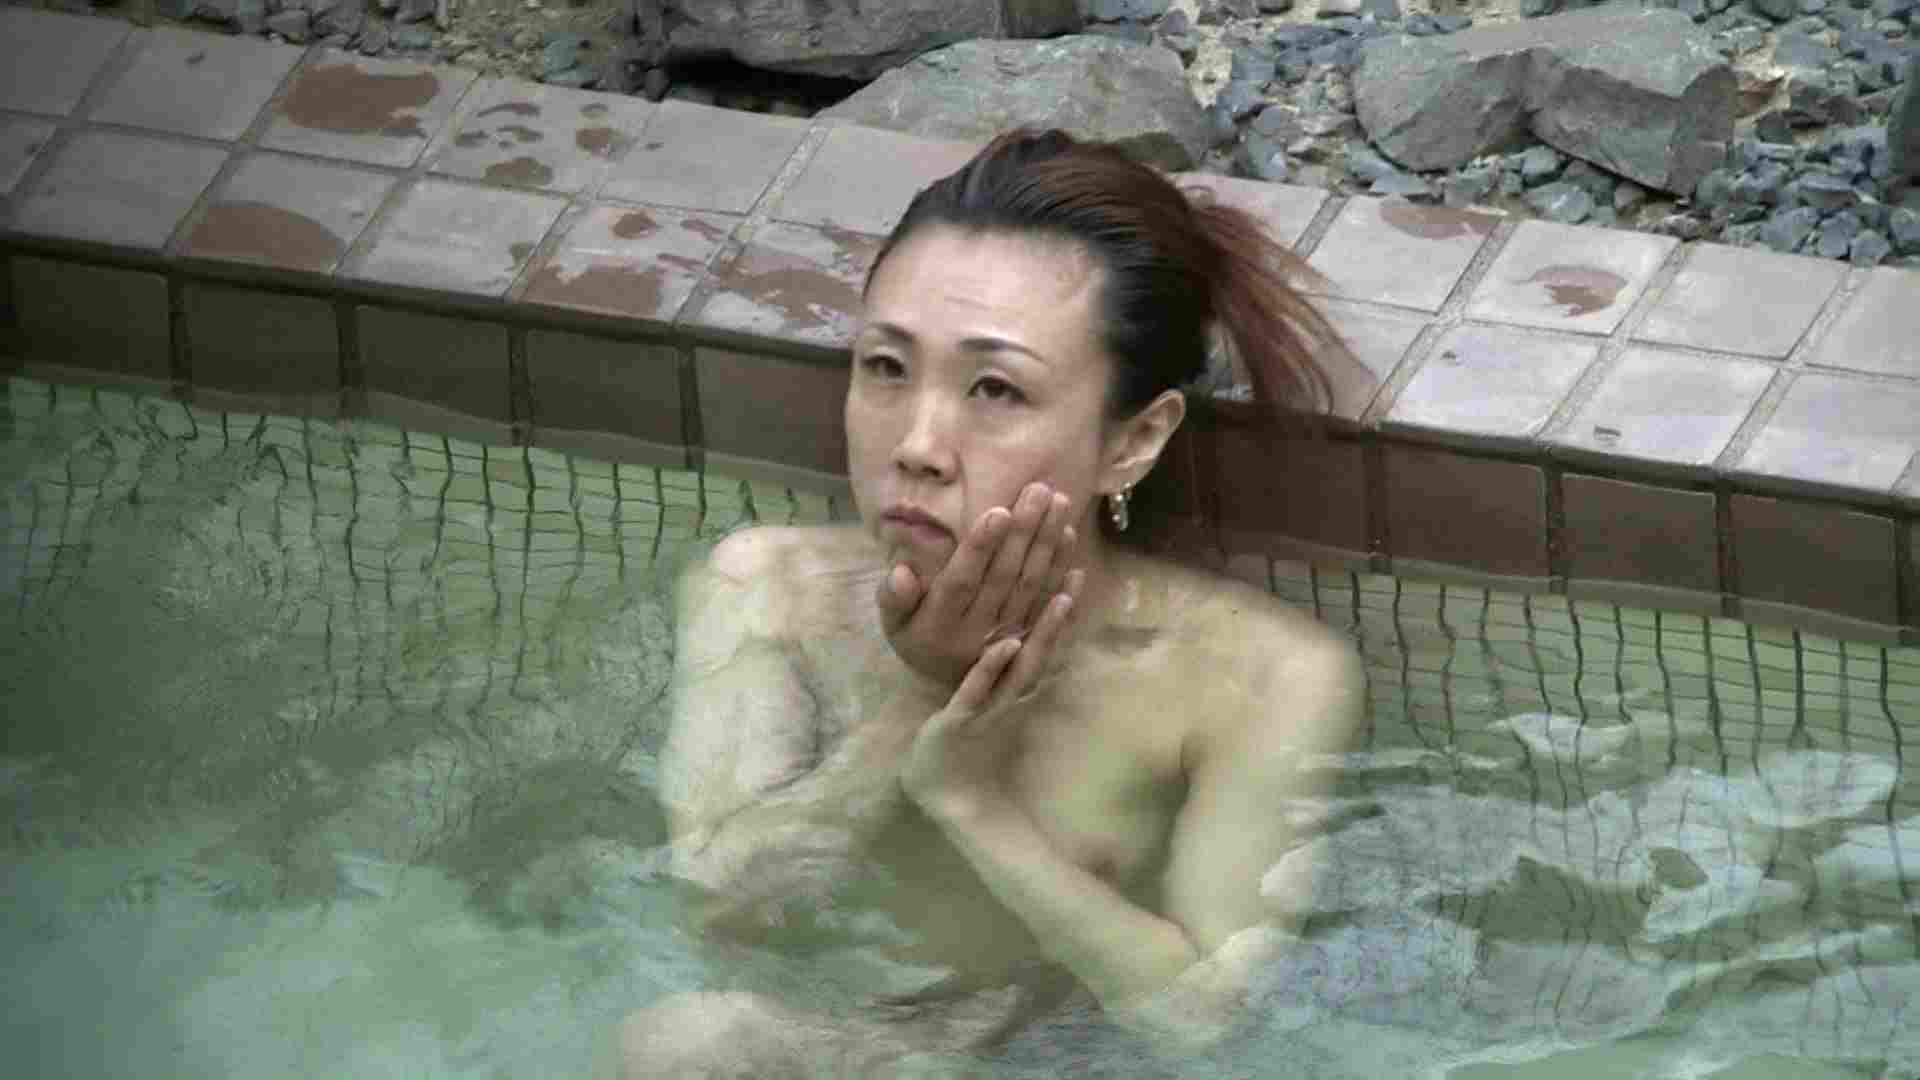 Aquaな露天風呂Vol.654 HなOL | 盗撮  60pic 43